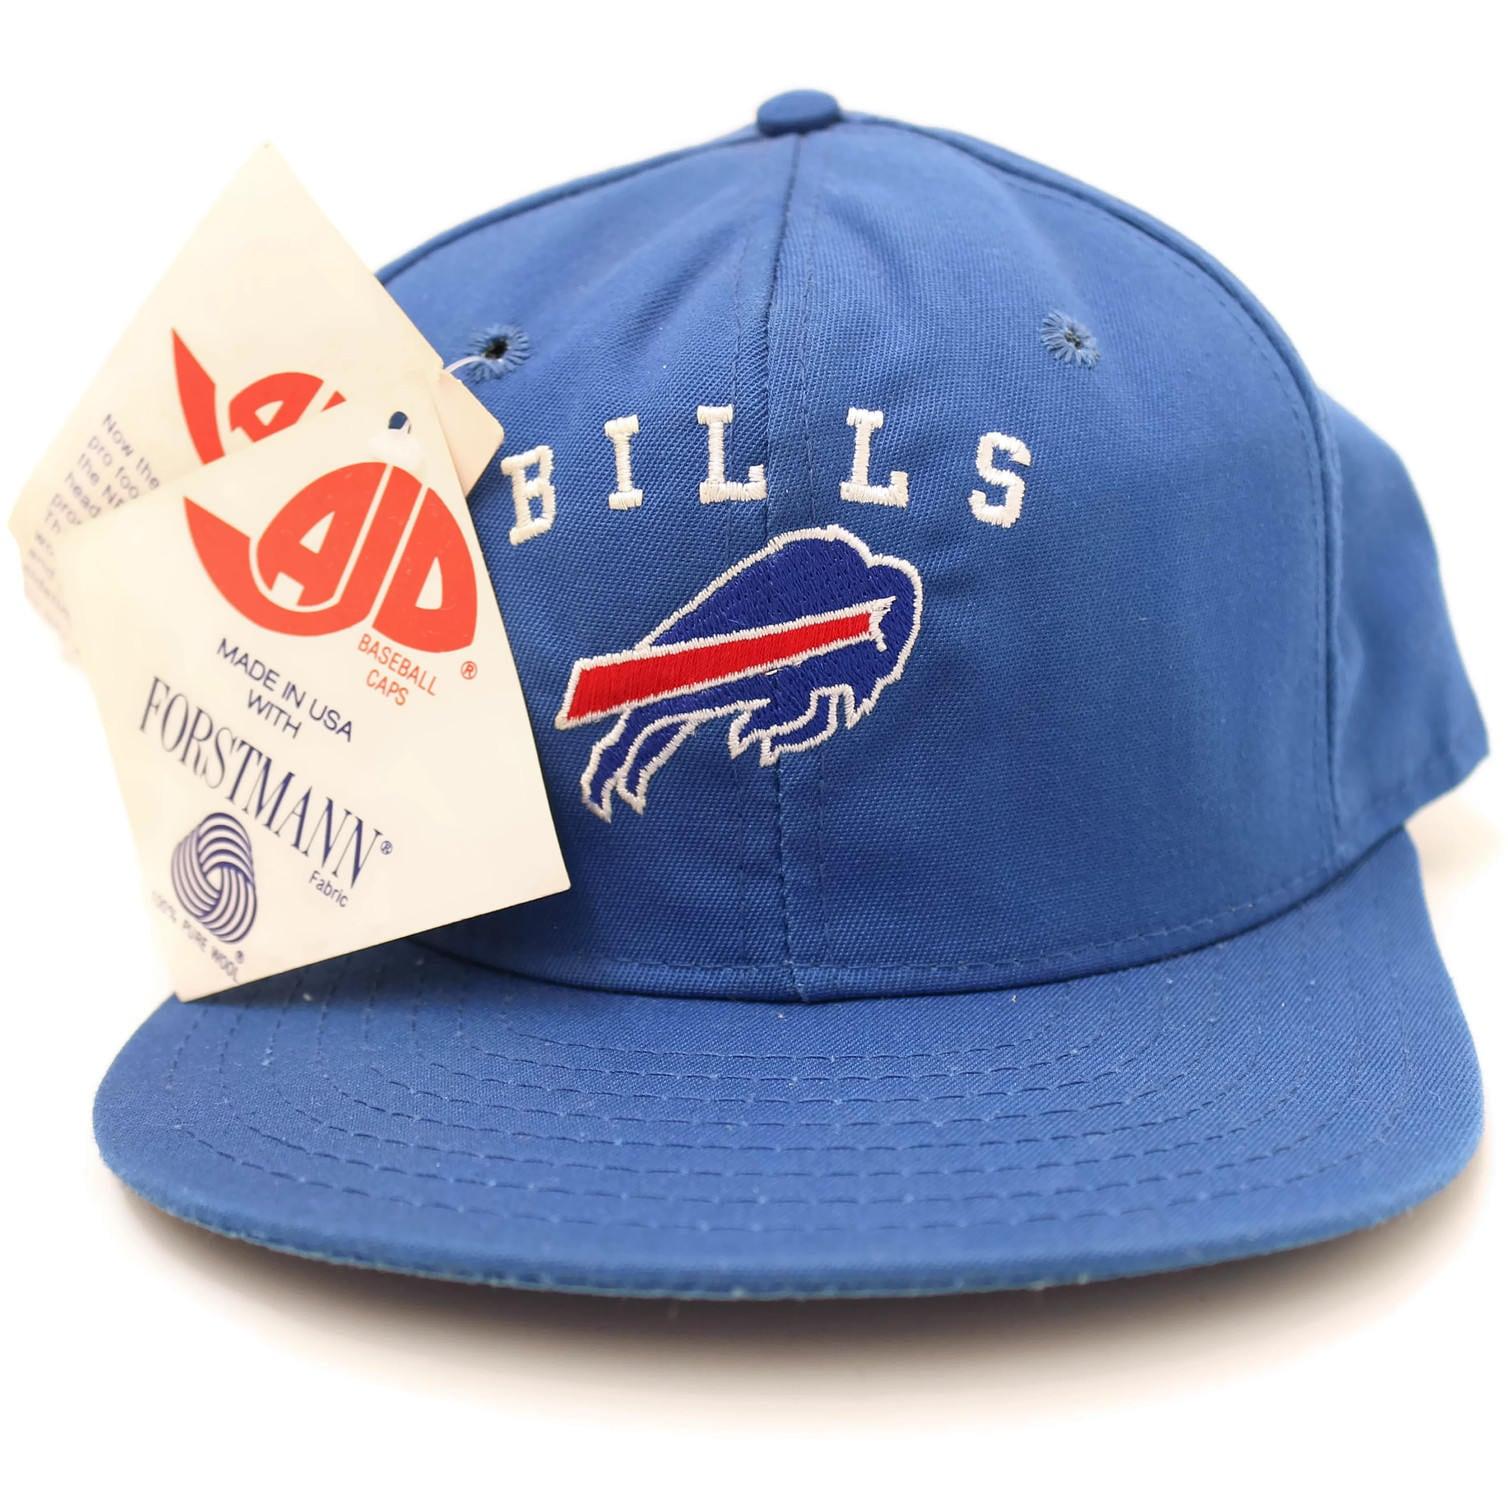 3fa09c47414 New Old Stock Buffalo Bills Vintage Snapback Hat Blue Script AJD 1980s Made  in USA